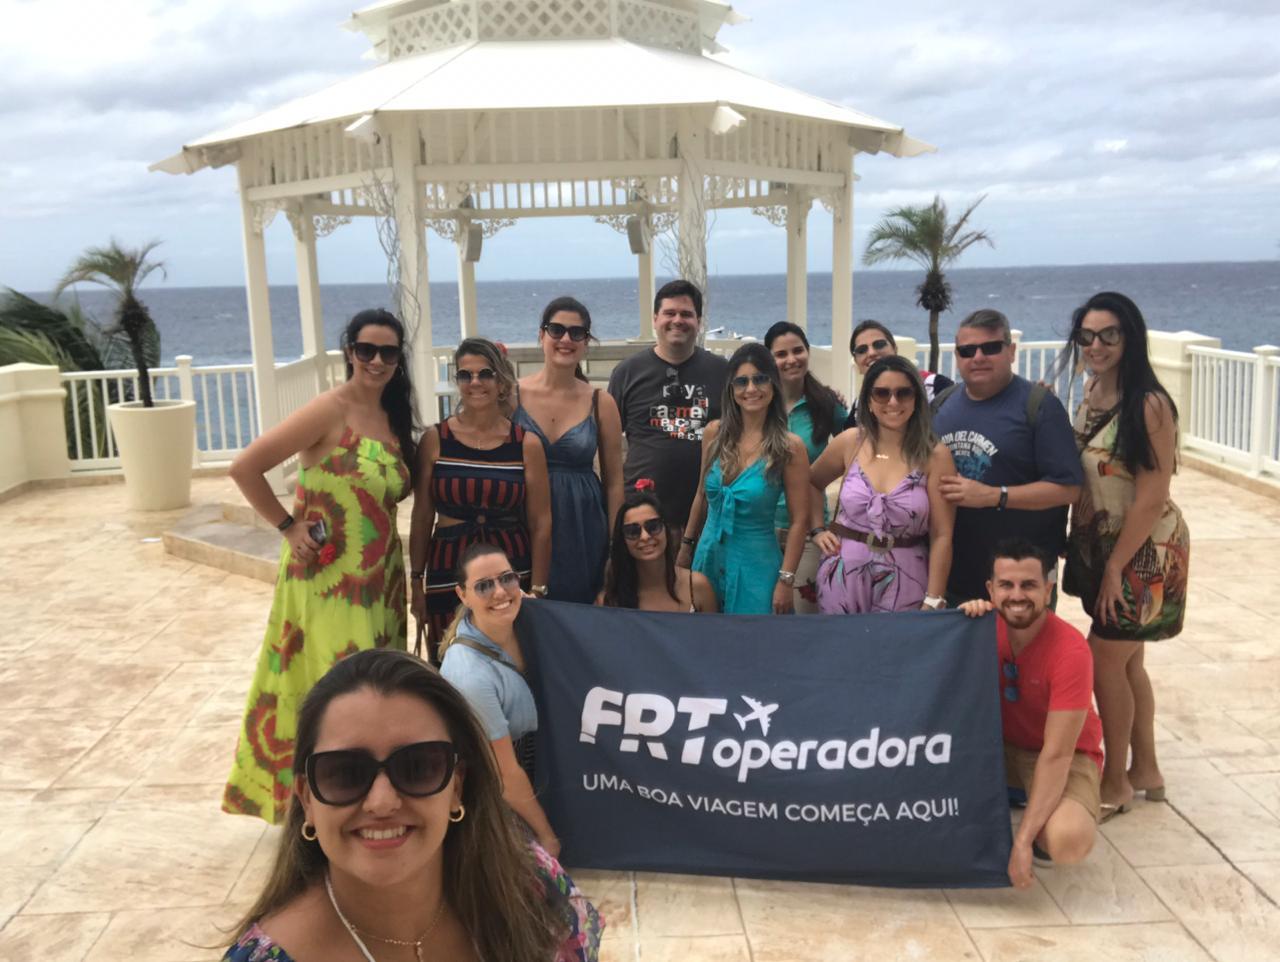 Palace Resorts FRT Operadora